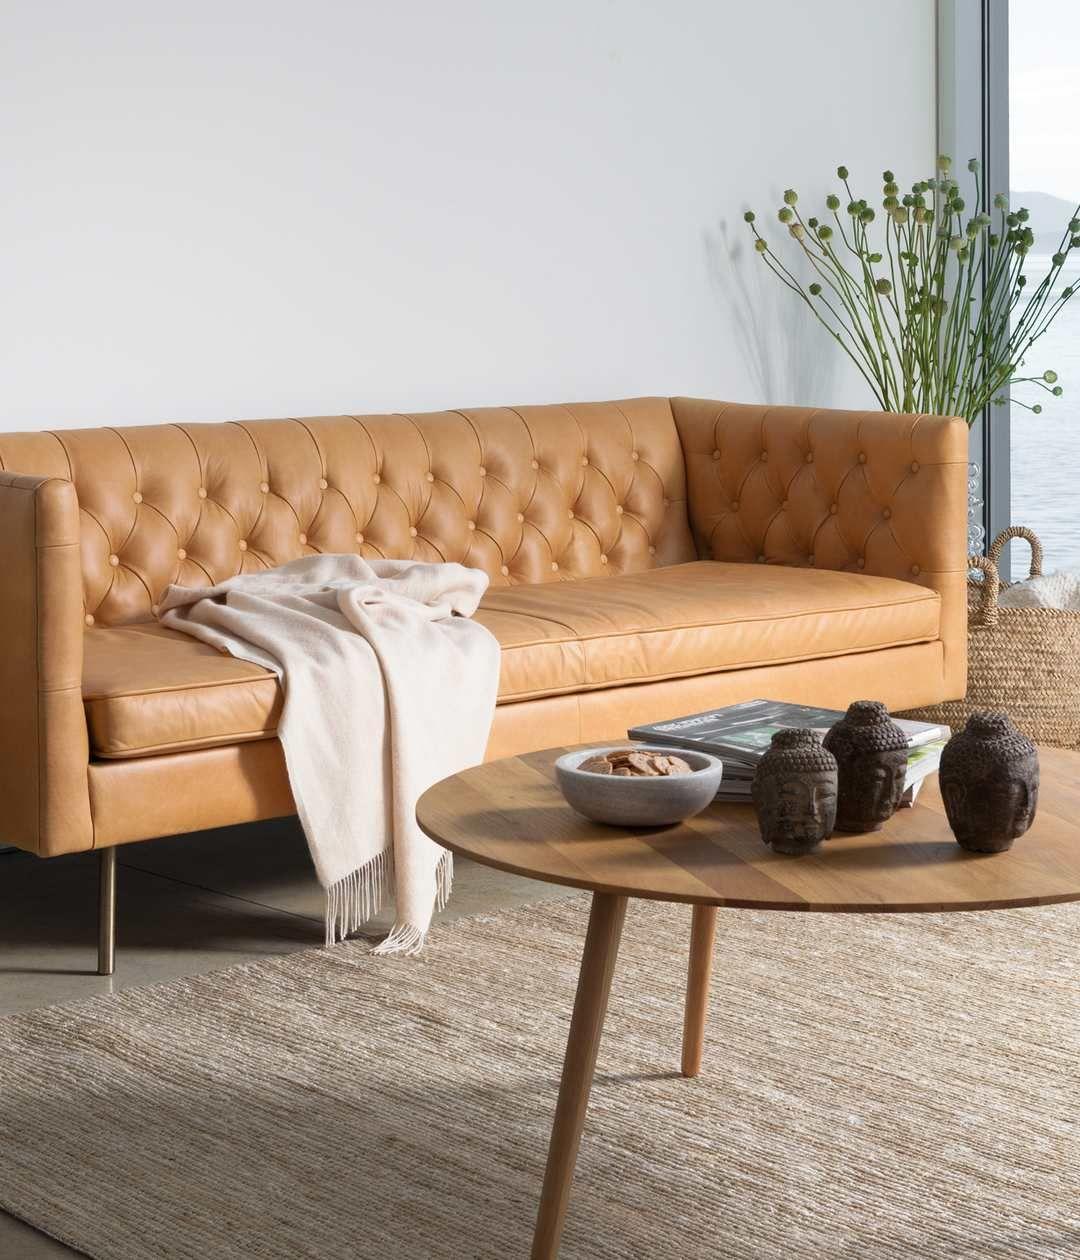 Superb Article   LOOKBOOK NO.3 Scandinavian Furniture, Home Design Decor, House  Design,